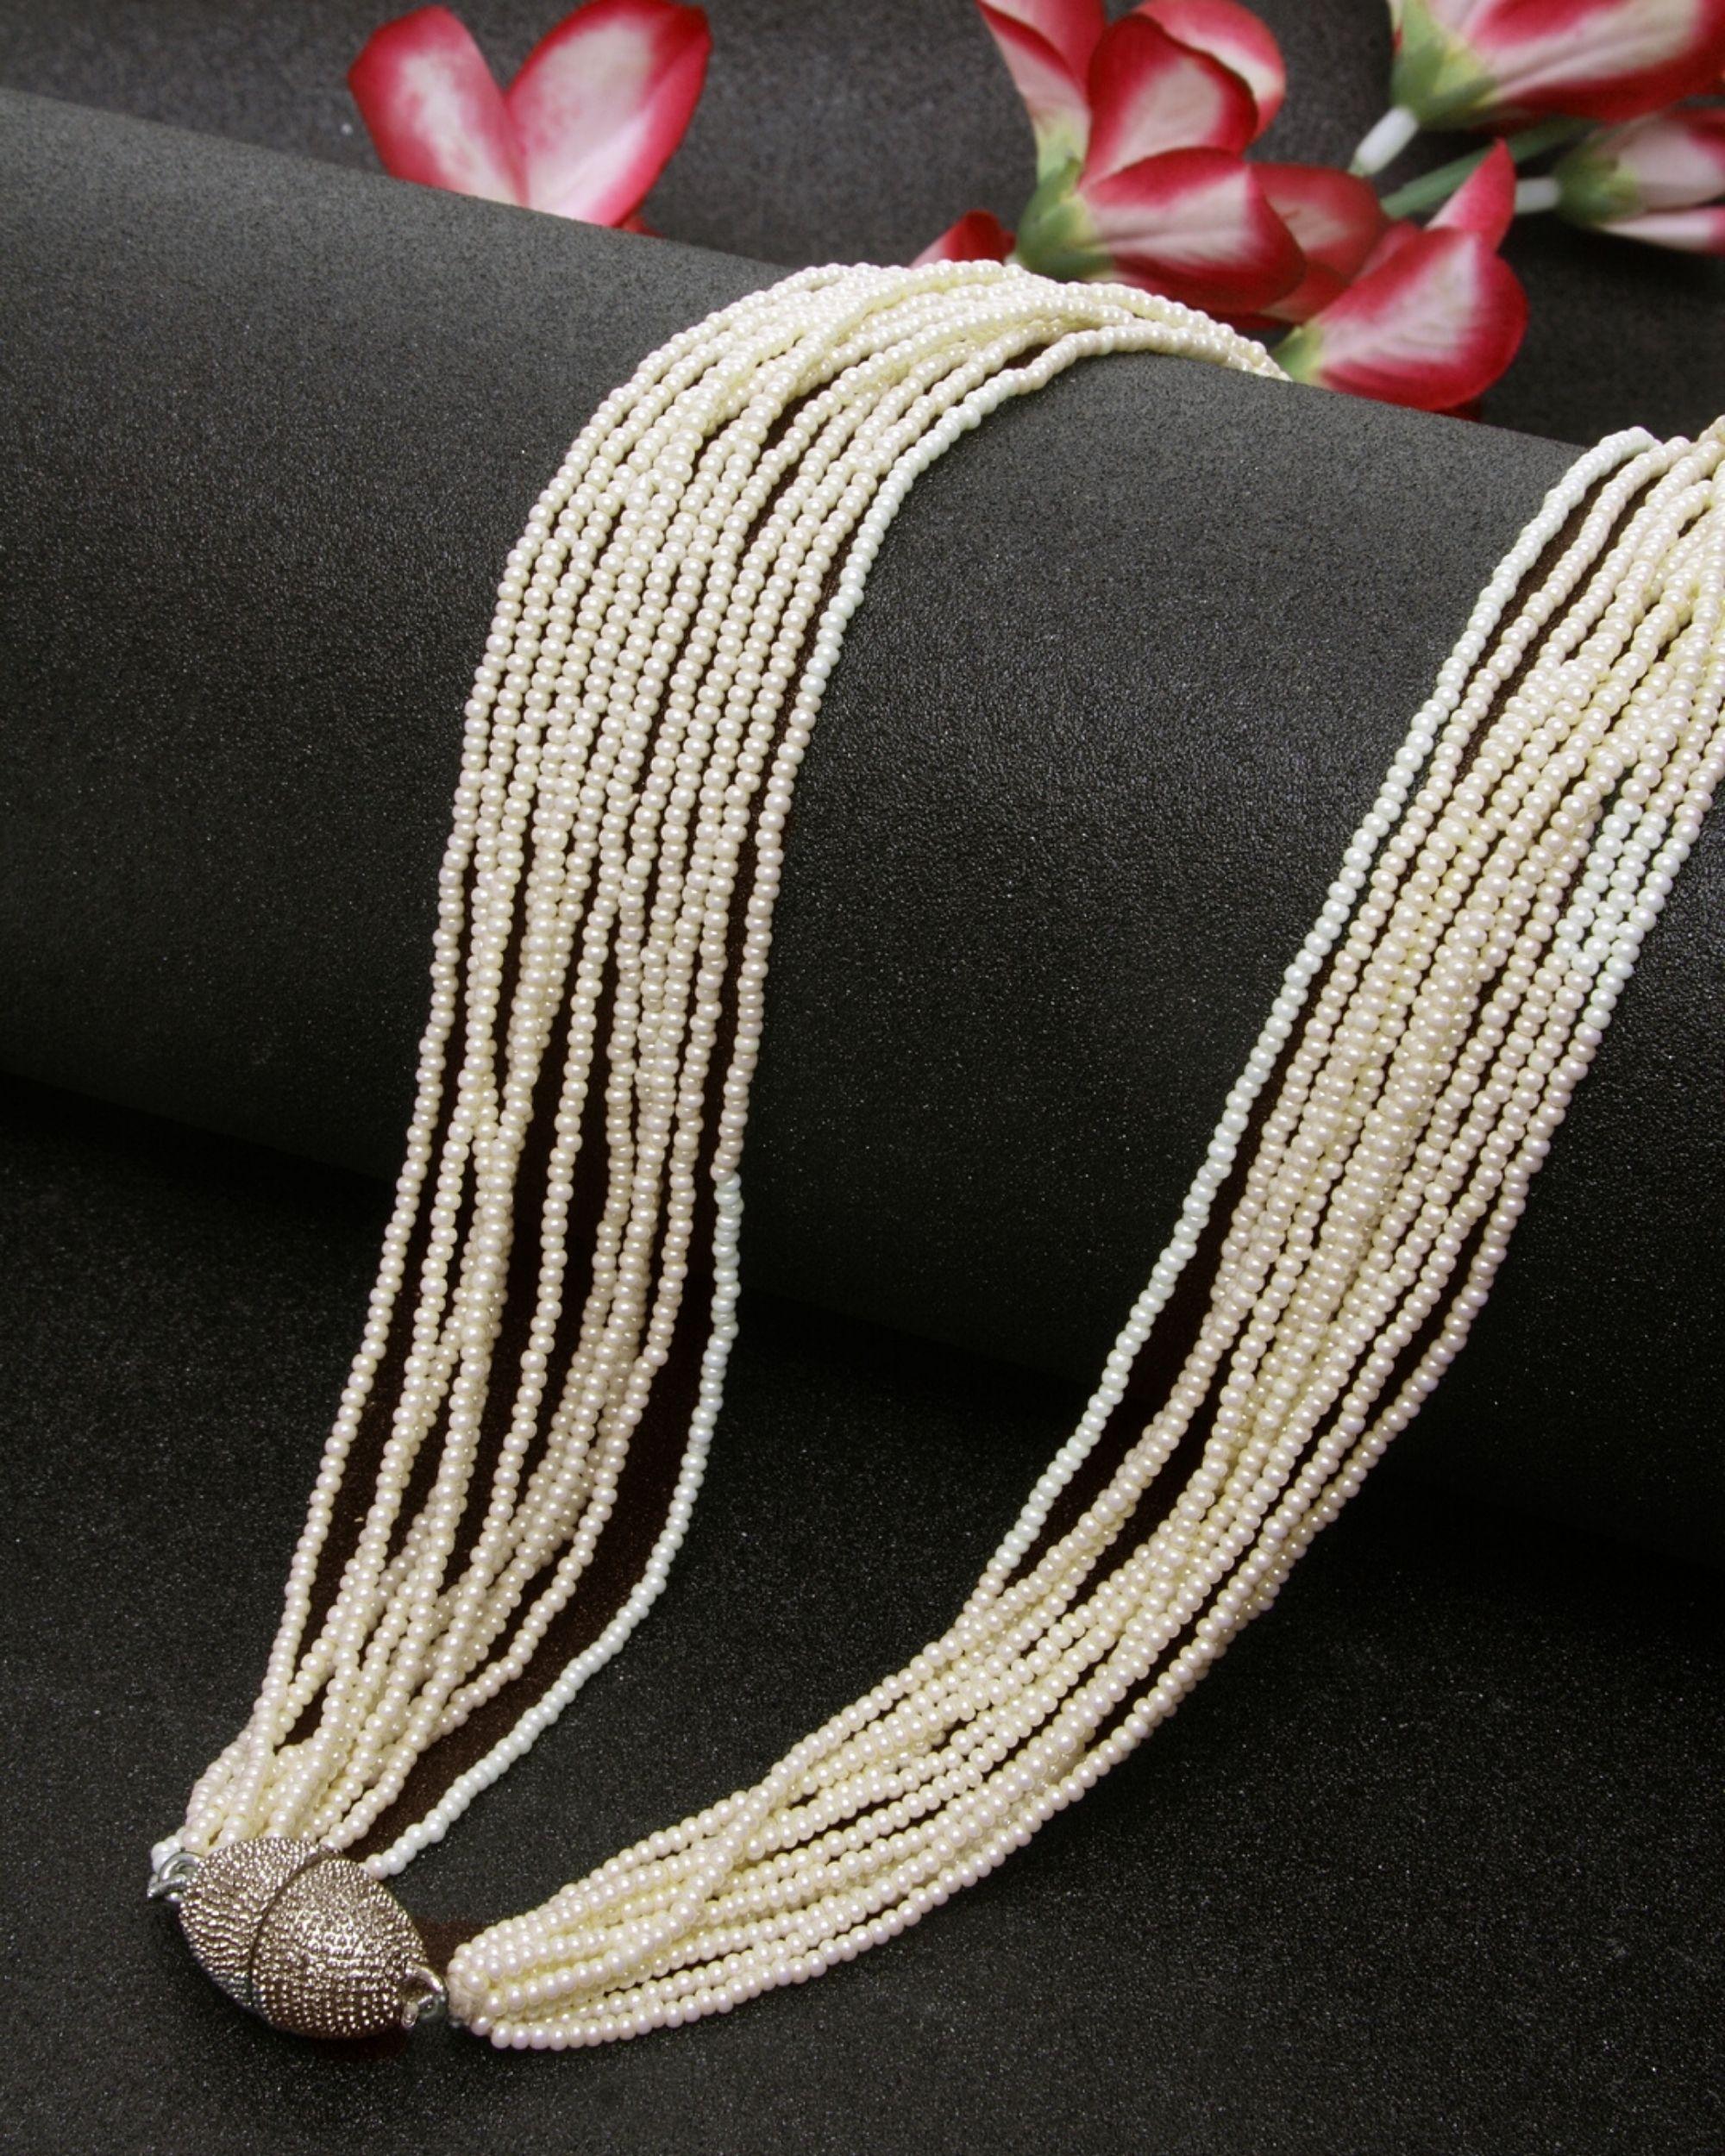 Pearl string neckpiece